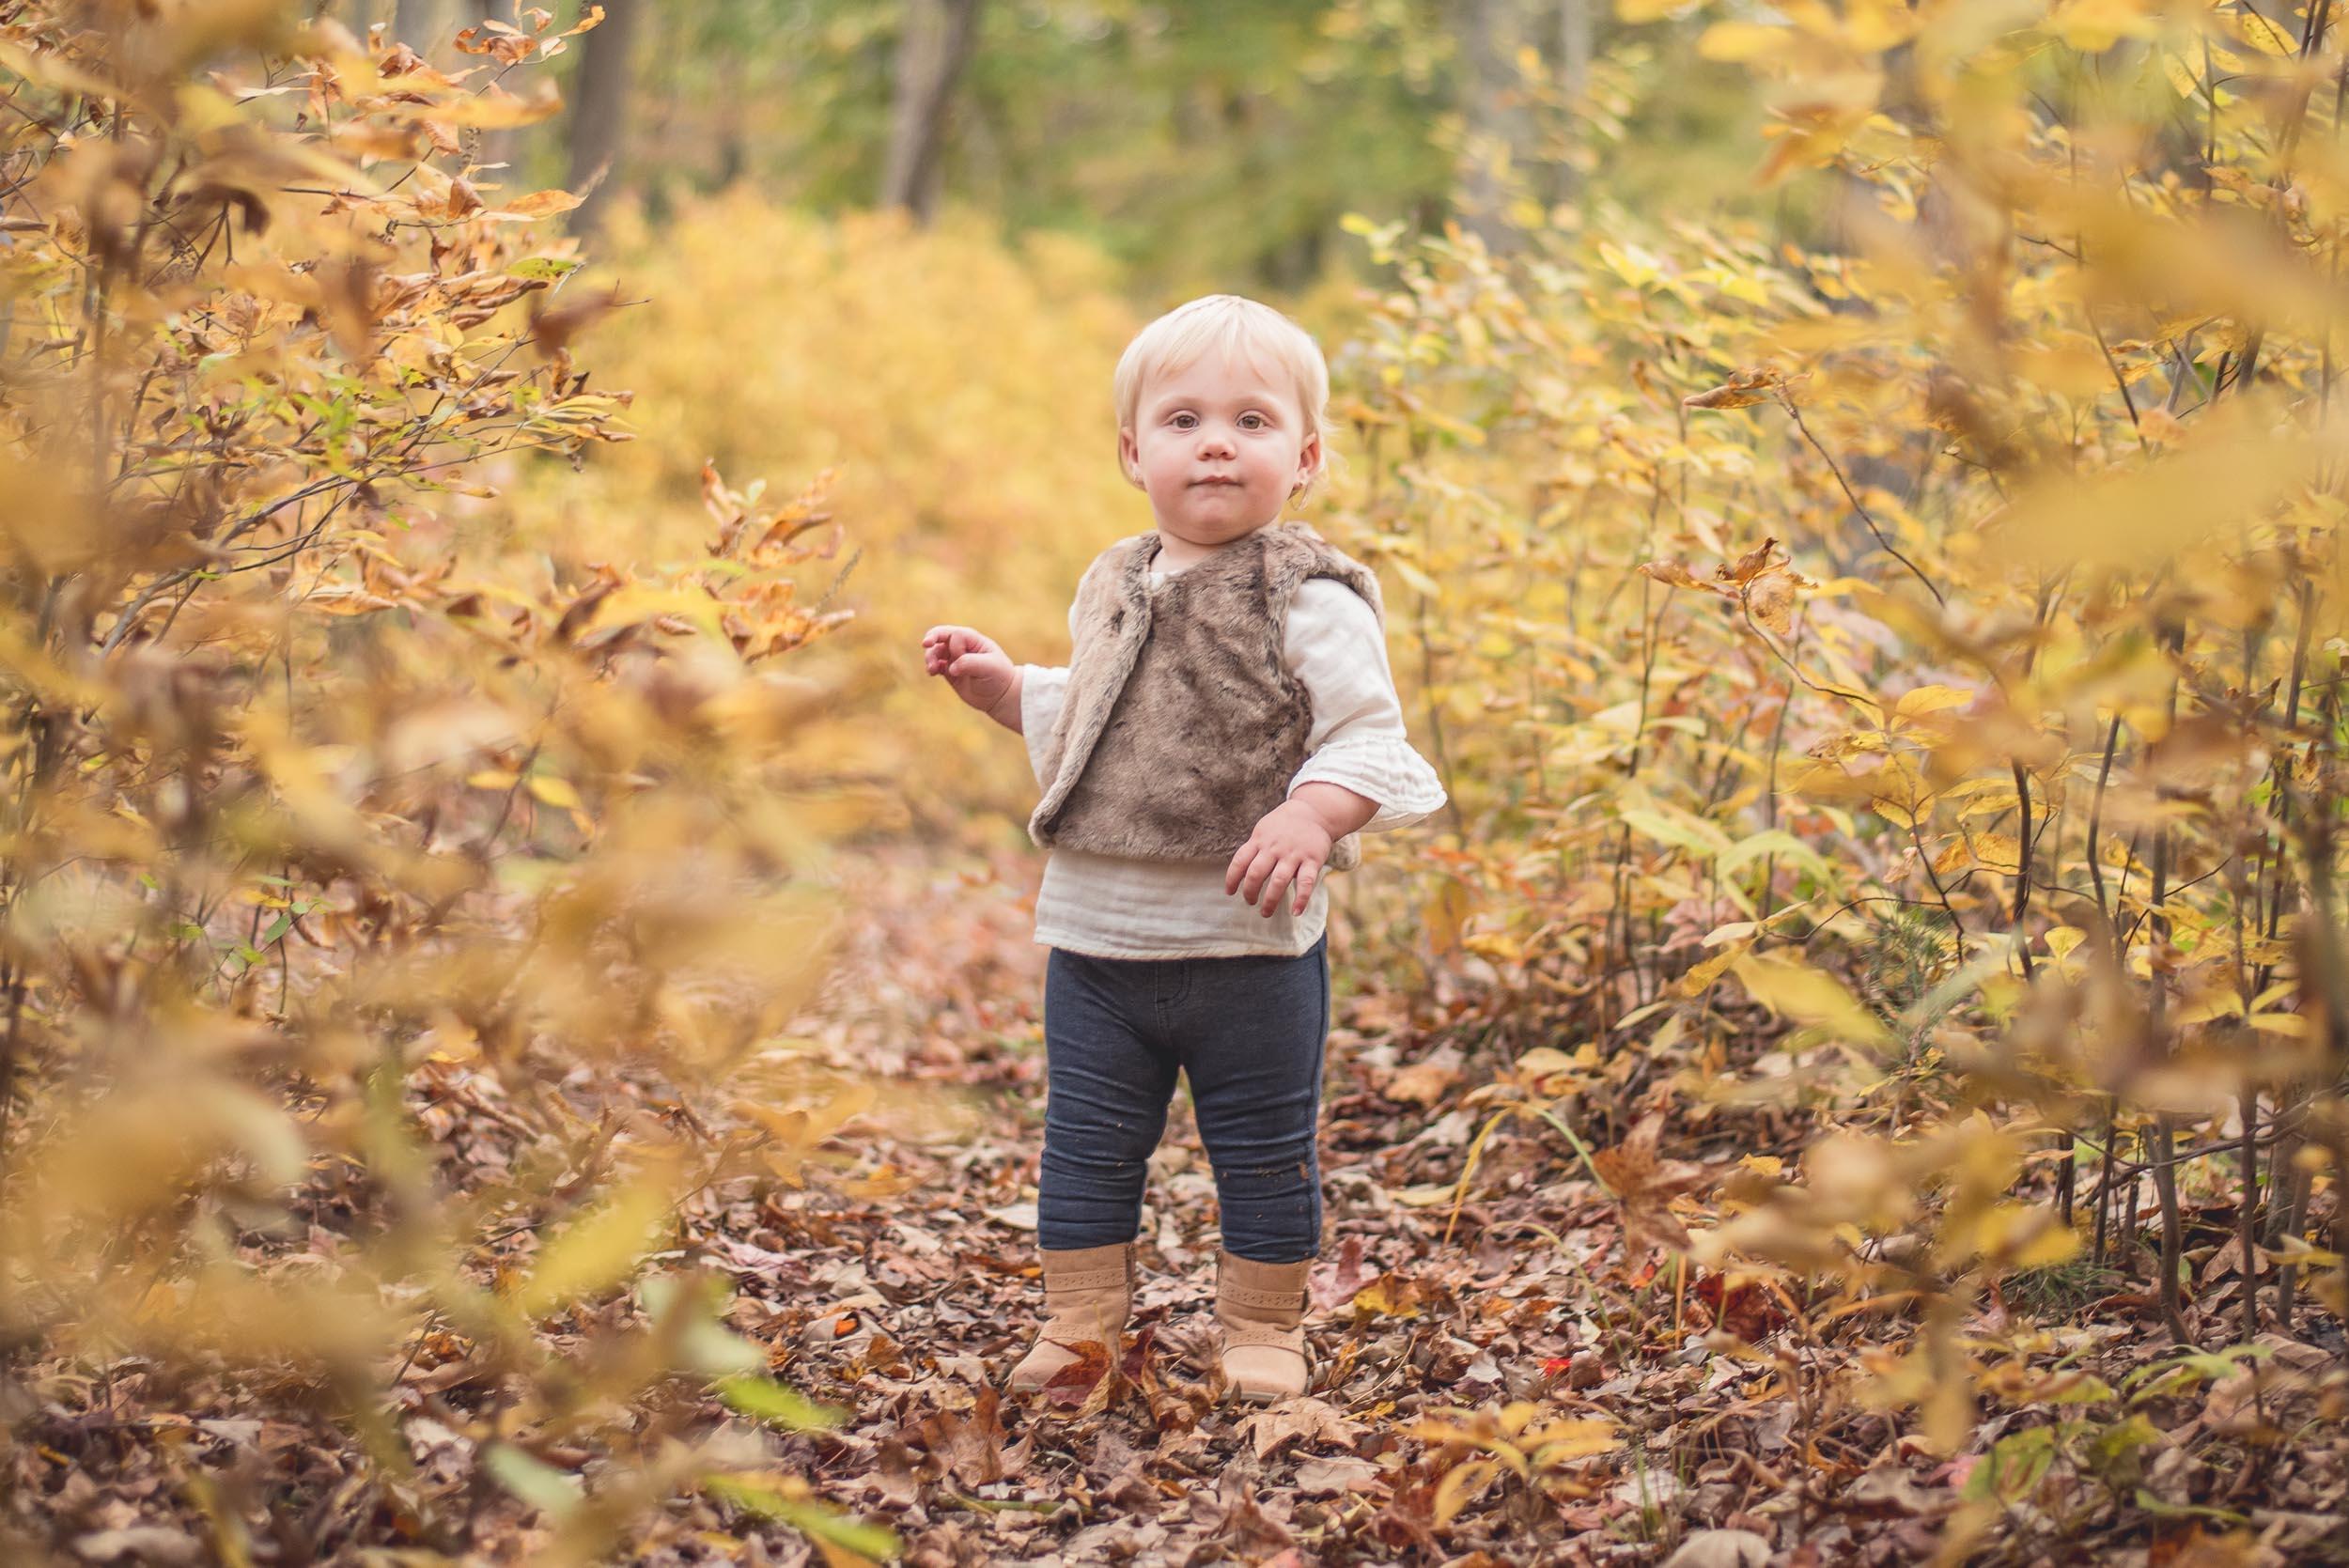 Ramsey_Child_Family_Photo_Session_Maryland_Crofton_Gambrills(8of12).jpg